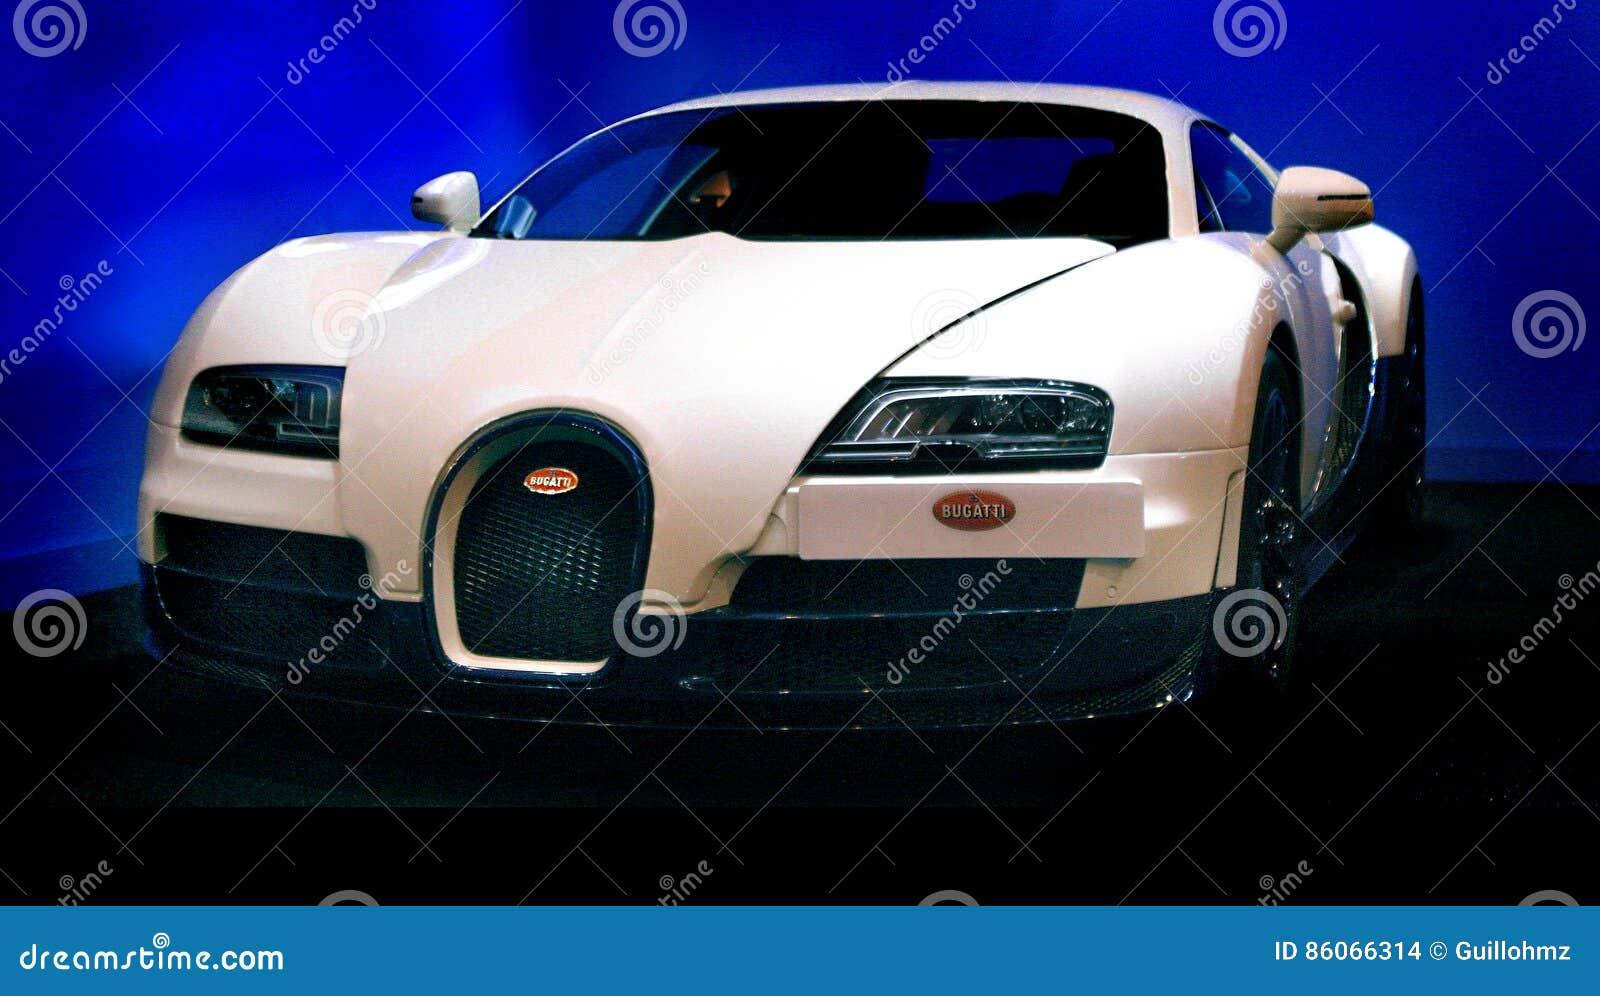 bugatti veyron sport car editorial stock image image 86066314. Black Bedroom Furniture Sets. Home Design Ideas